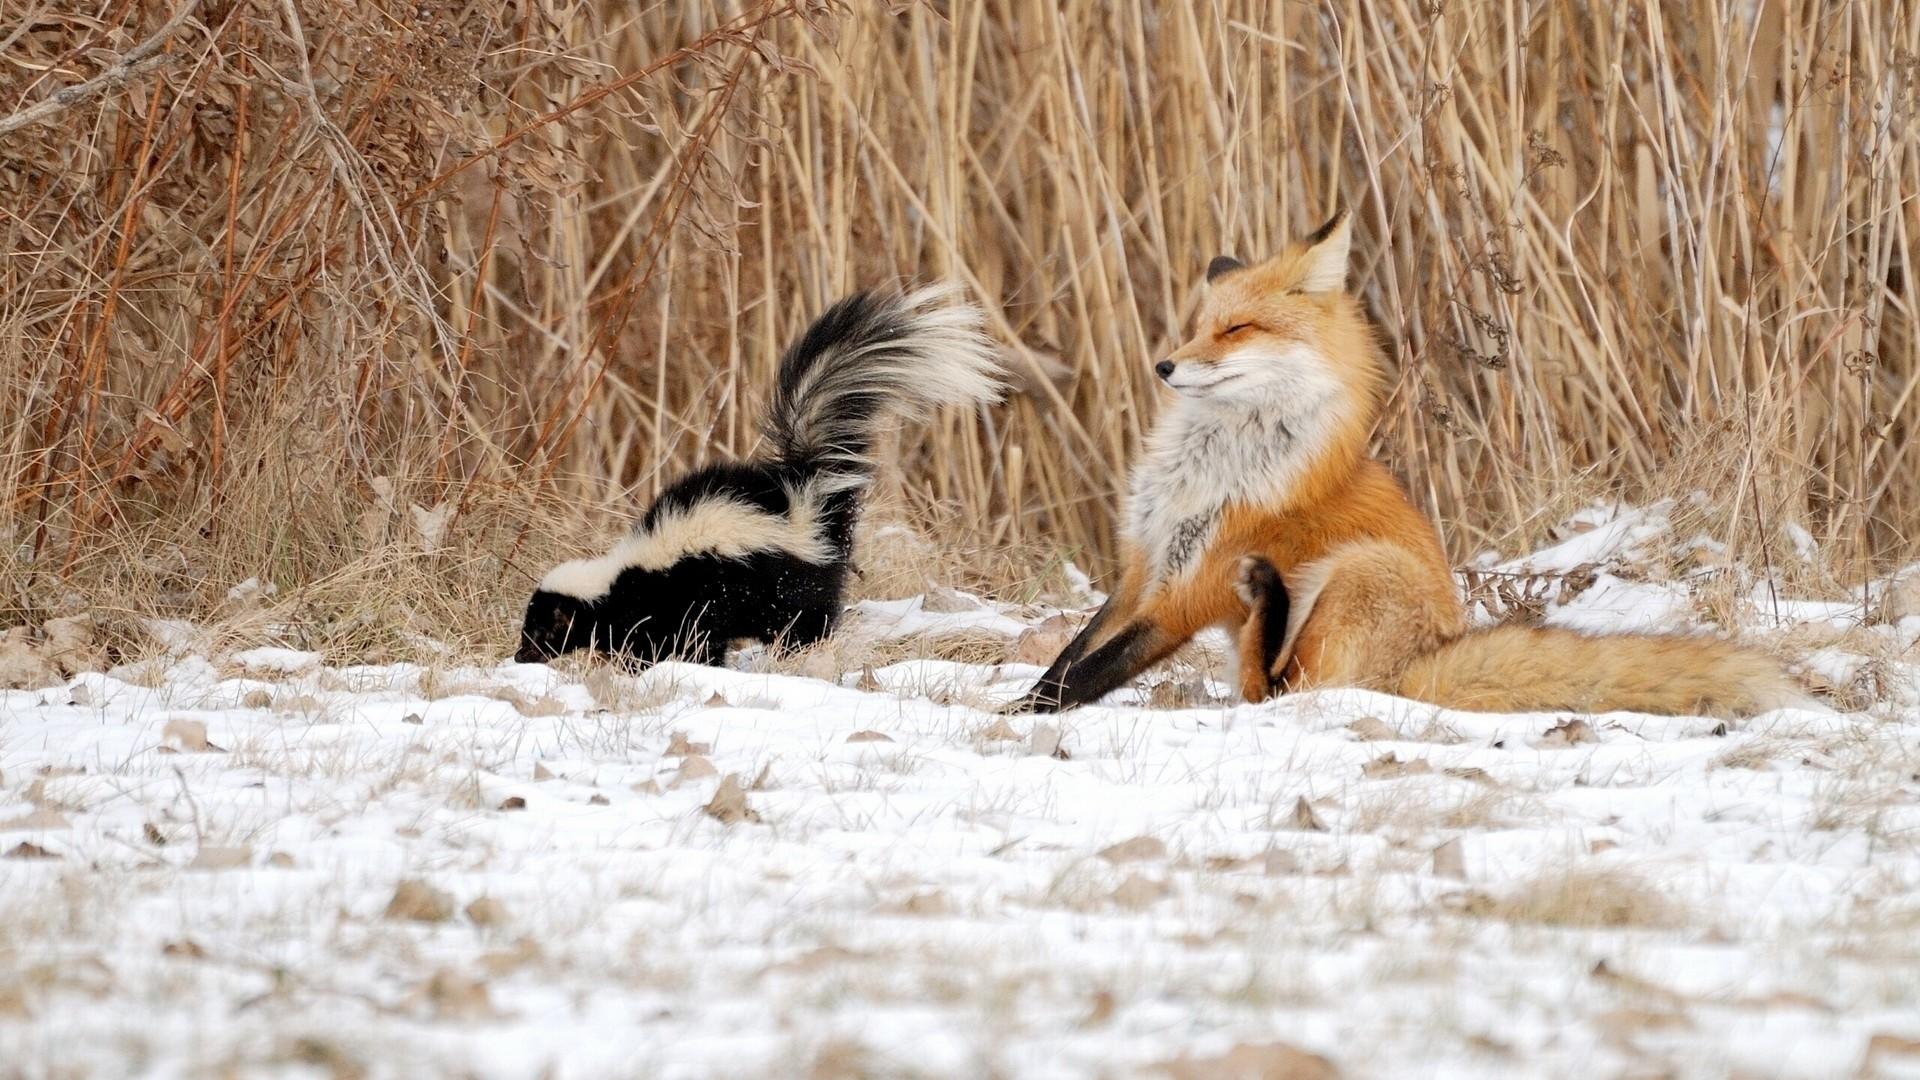 animal winter desktop wallpaper (59+ images)